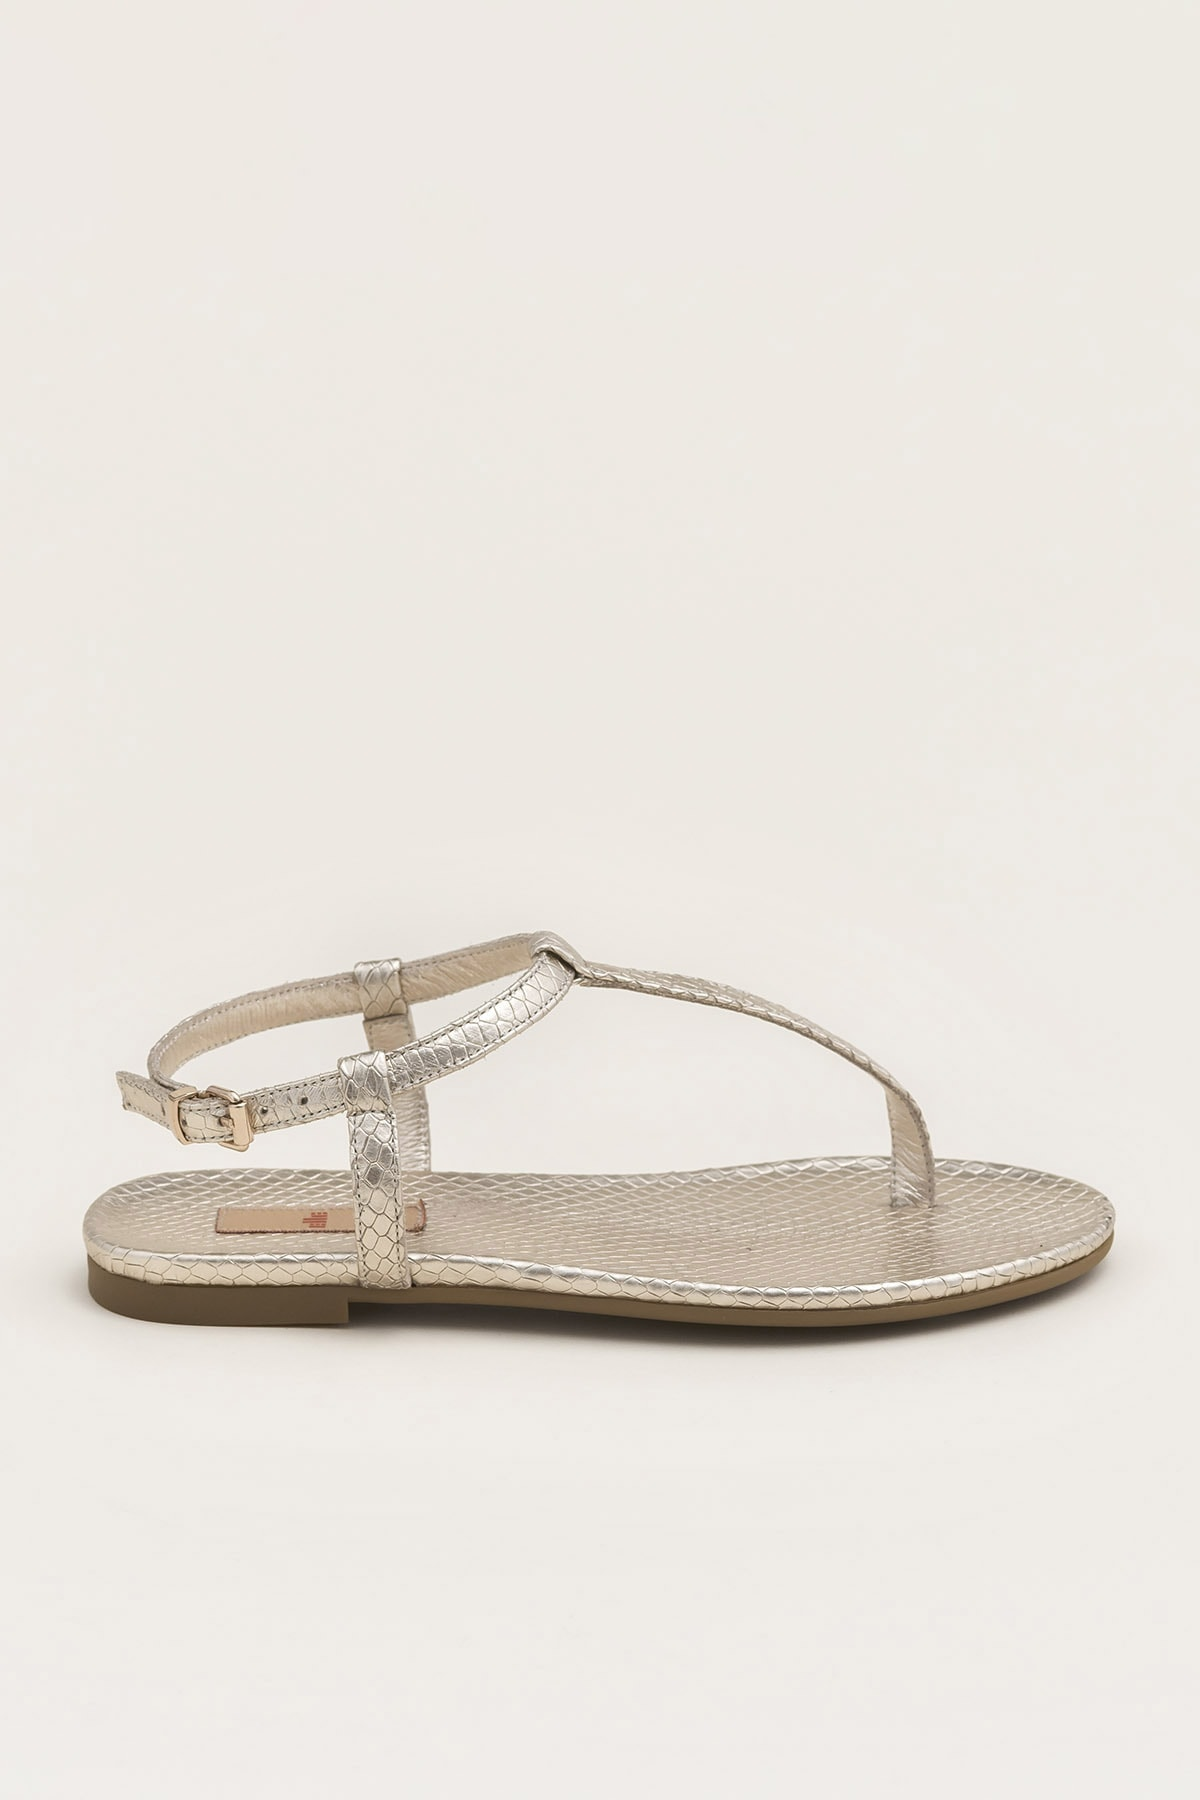 Elle Shoes RADELLA Hakiki Deri Gold Kadın Sandalet 20YLT101119 1